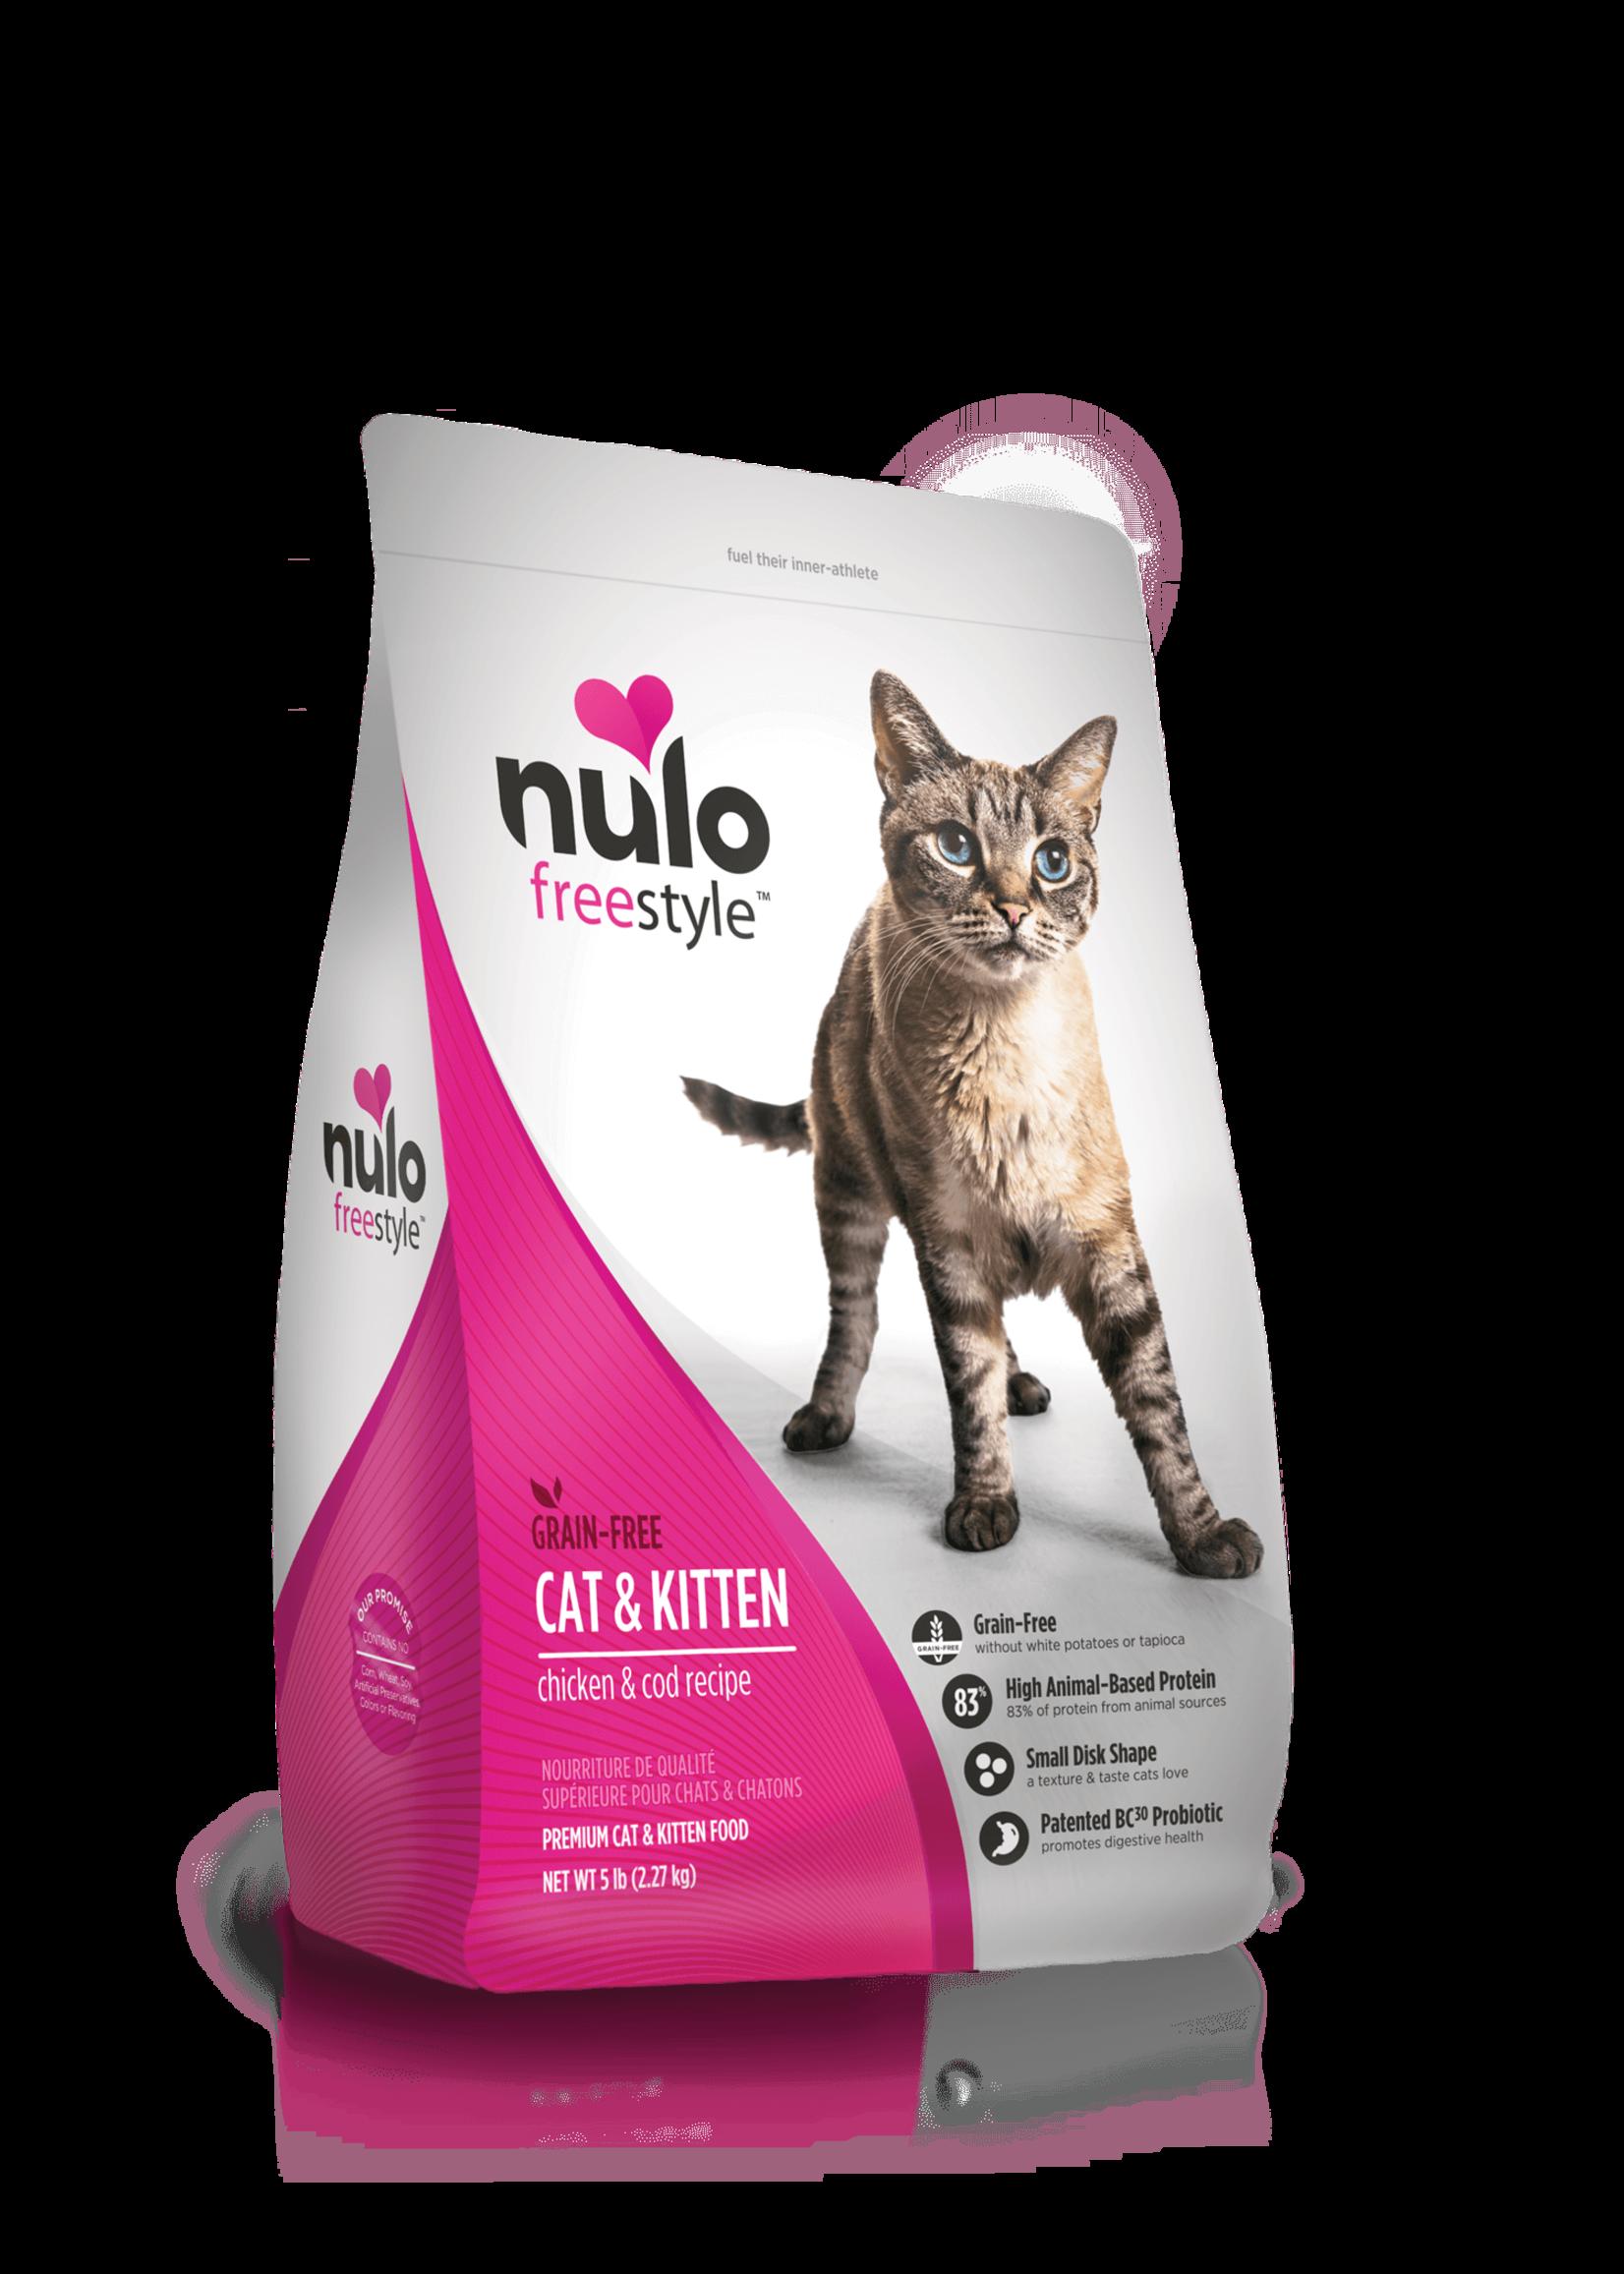 Nulo Nulo FreeStyle Grain Free Cat & Kitten Food Chicken & Cod, 5lb Bag